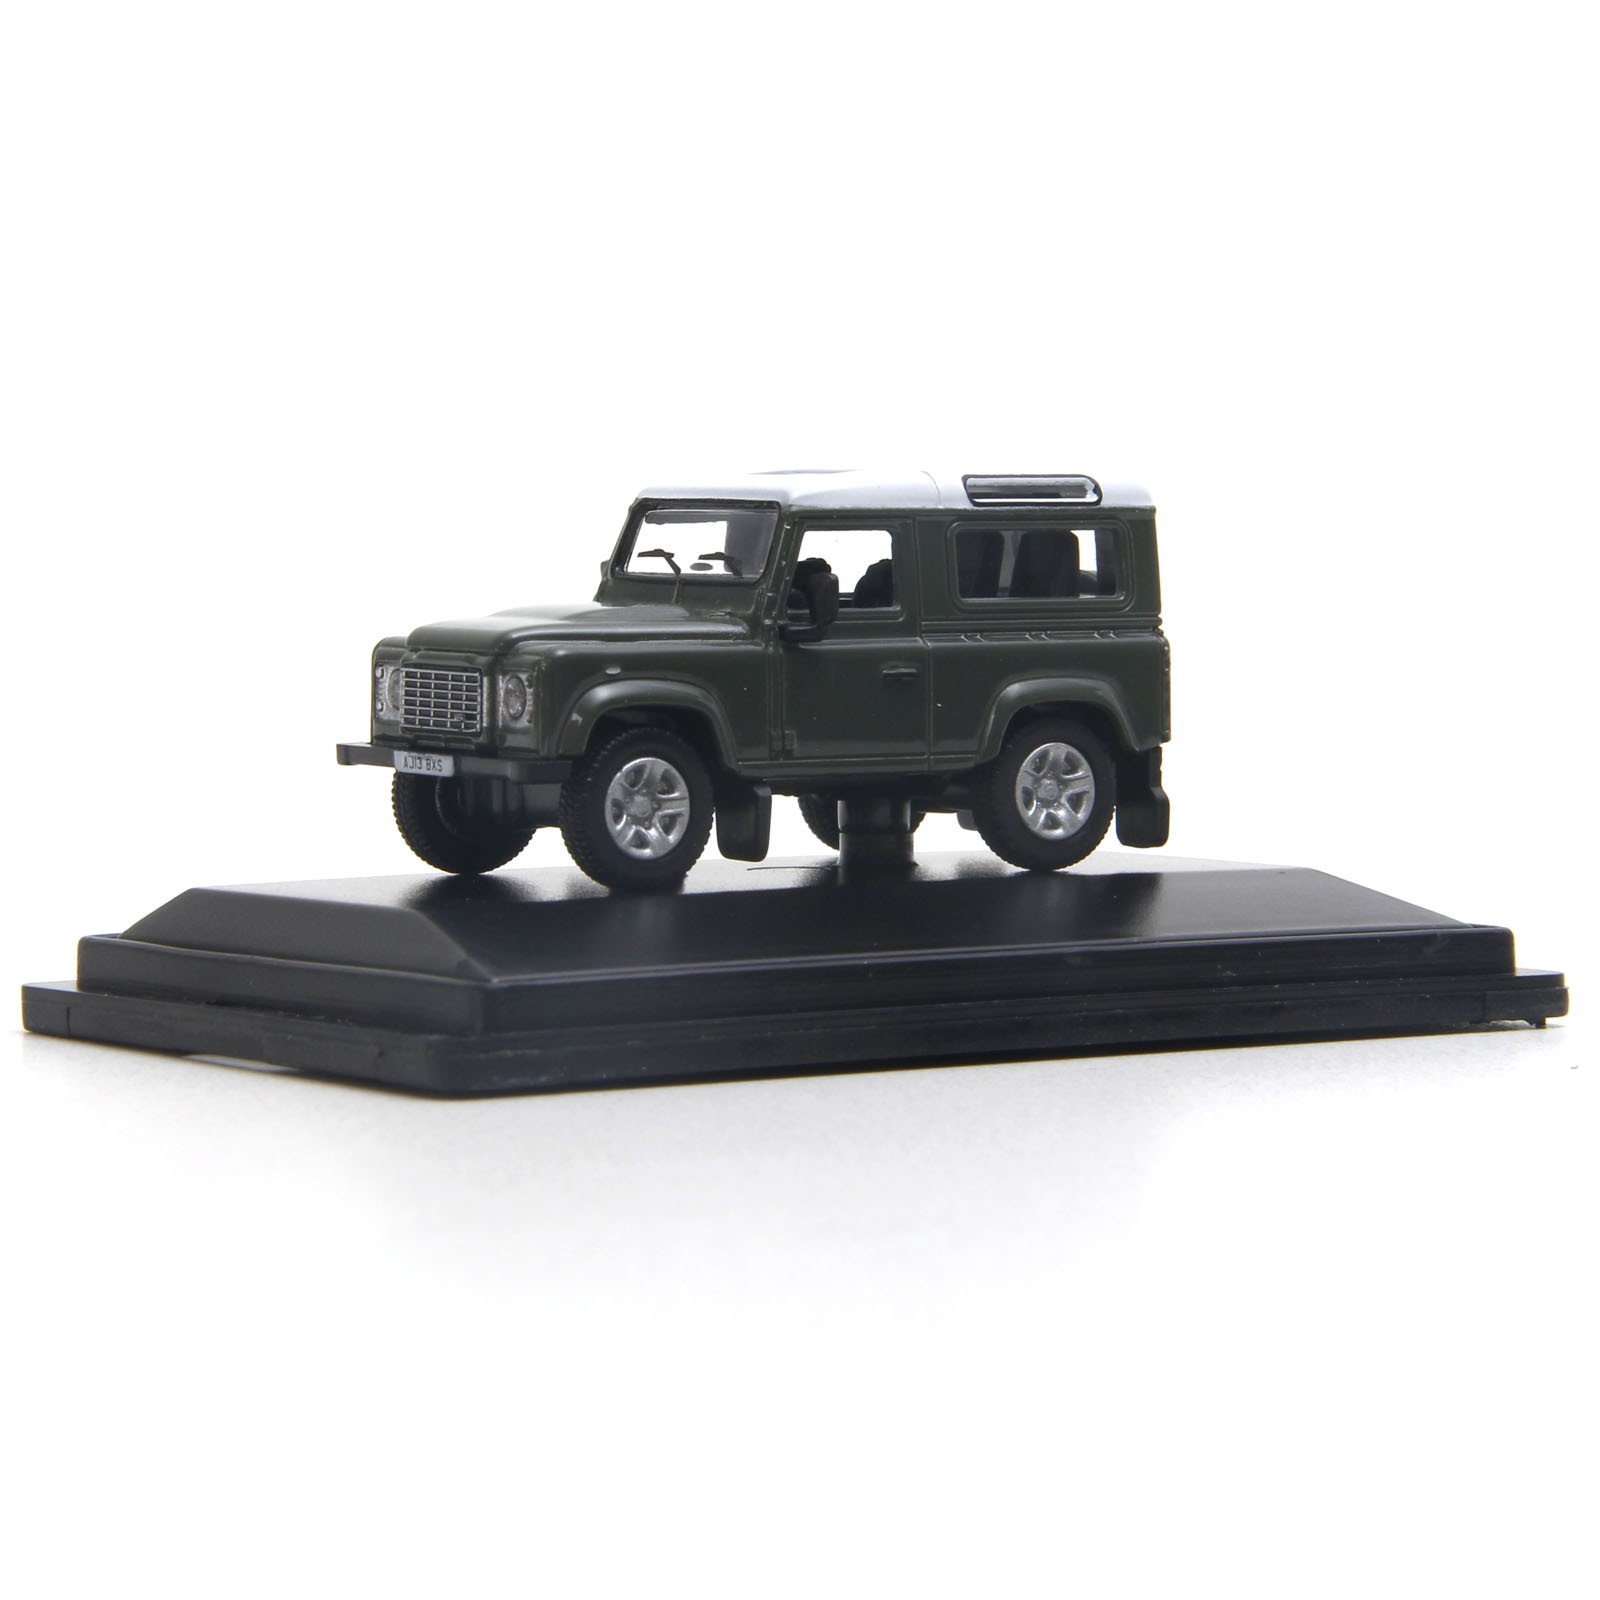 Miniatura em Metal - 1:76 - Land Rover Defender 90 - Keswick Green